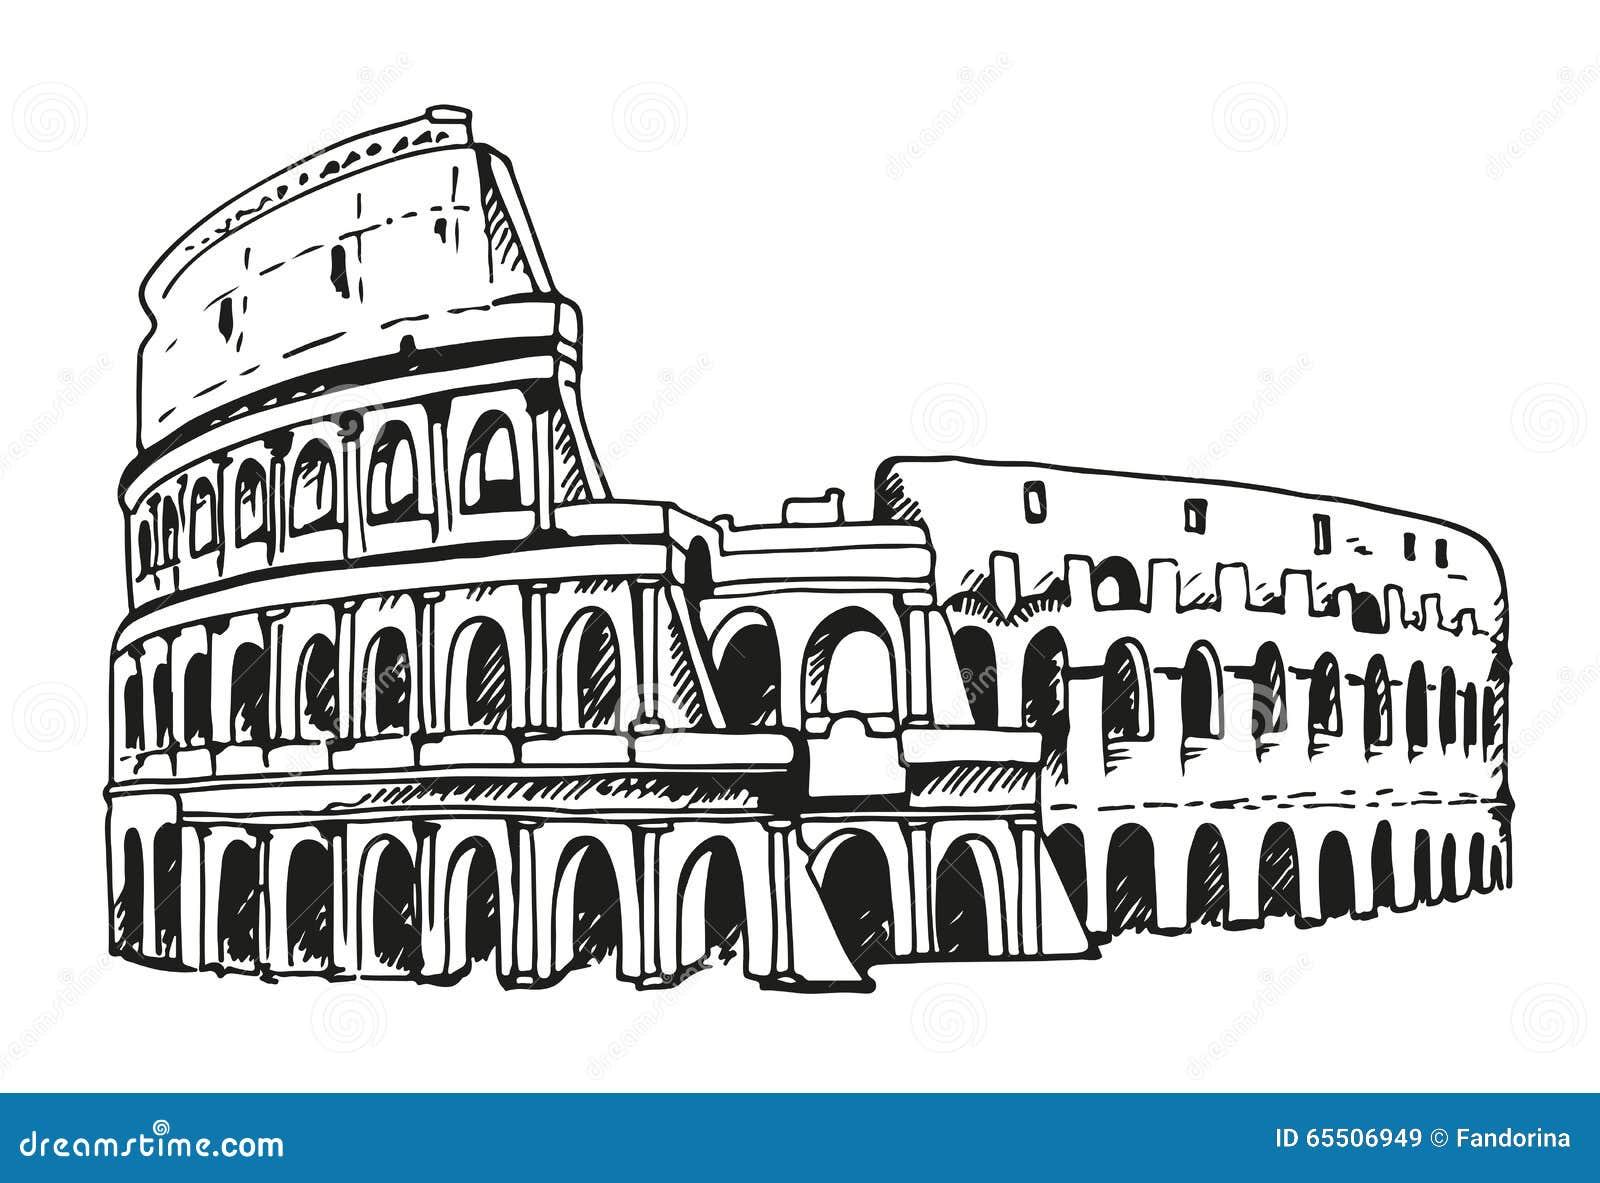 Drawing of coliseum colosseum illustration in rome italy for Colosseo da colorare